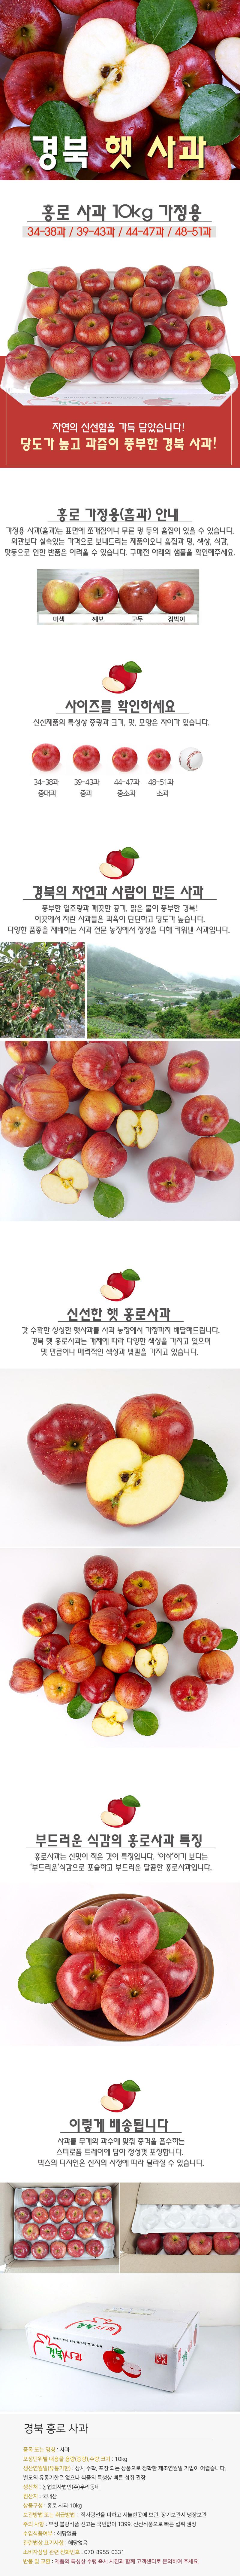 H_apple_home10.jpg